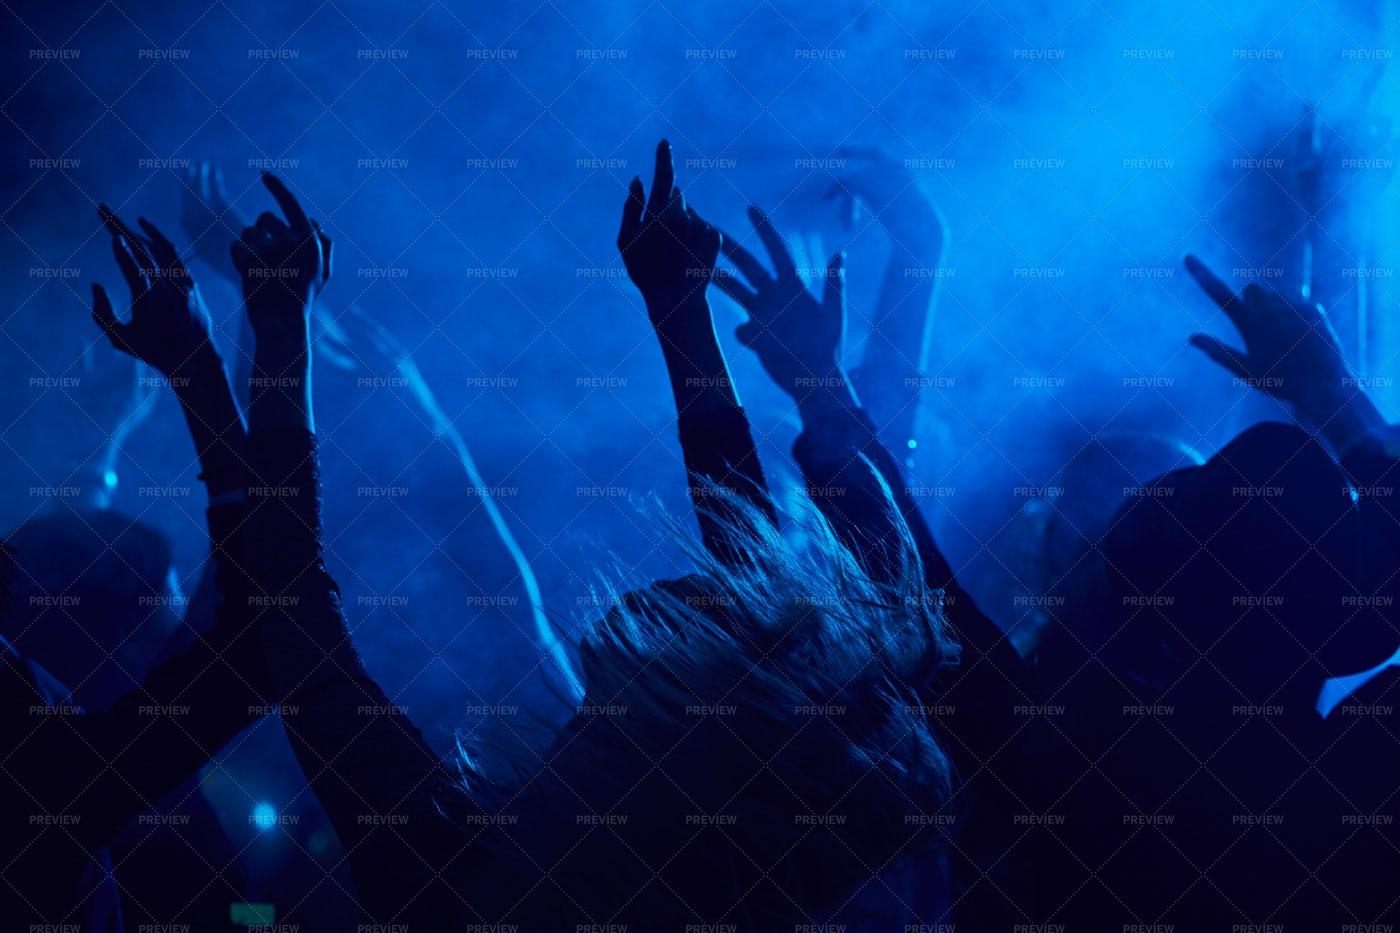 People Dancing In Nightclub: Stock Photos